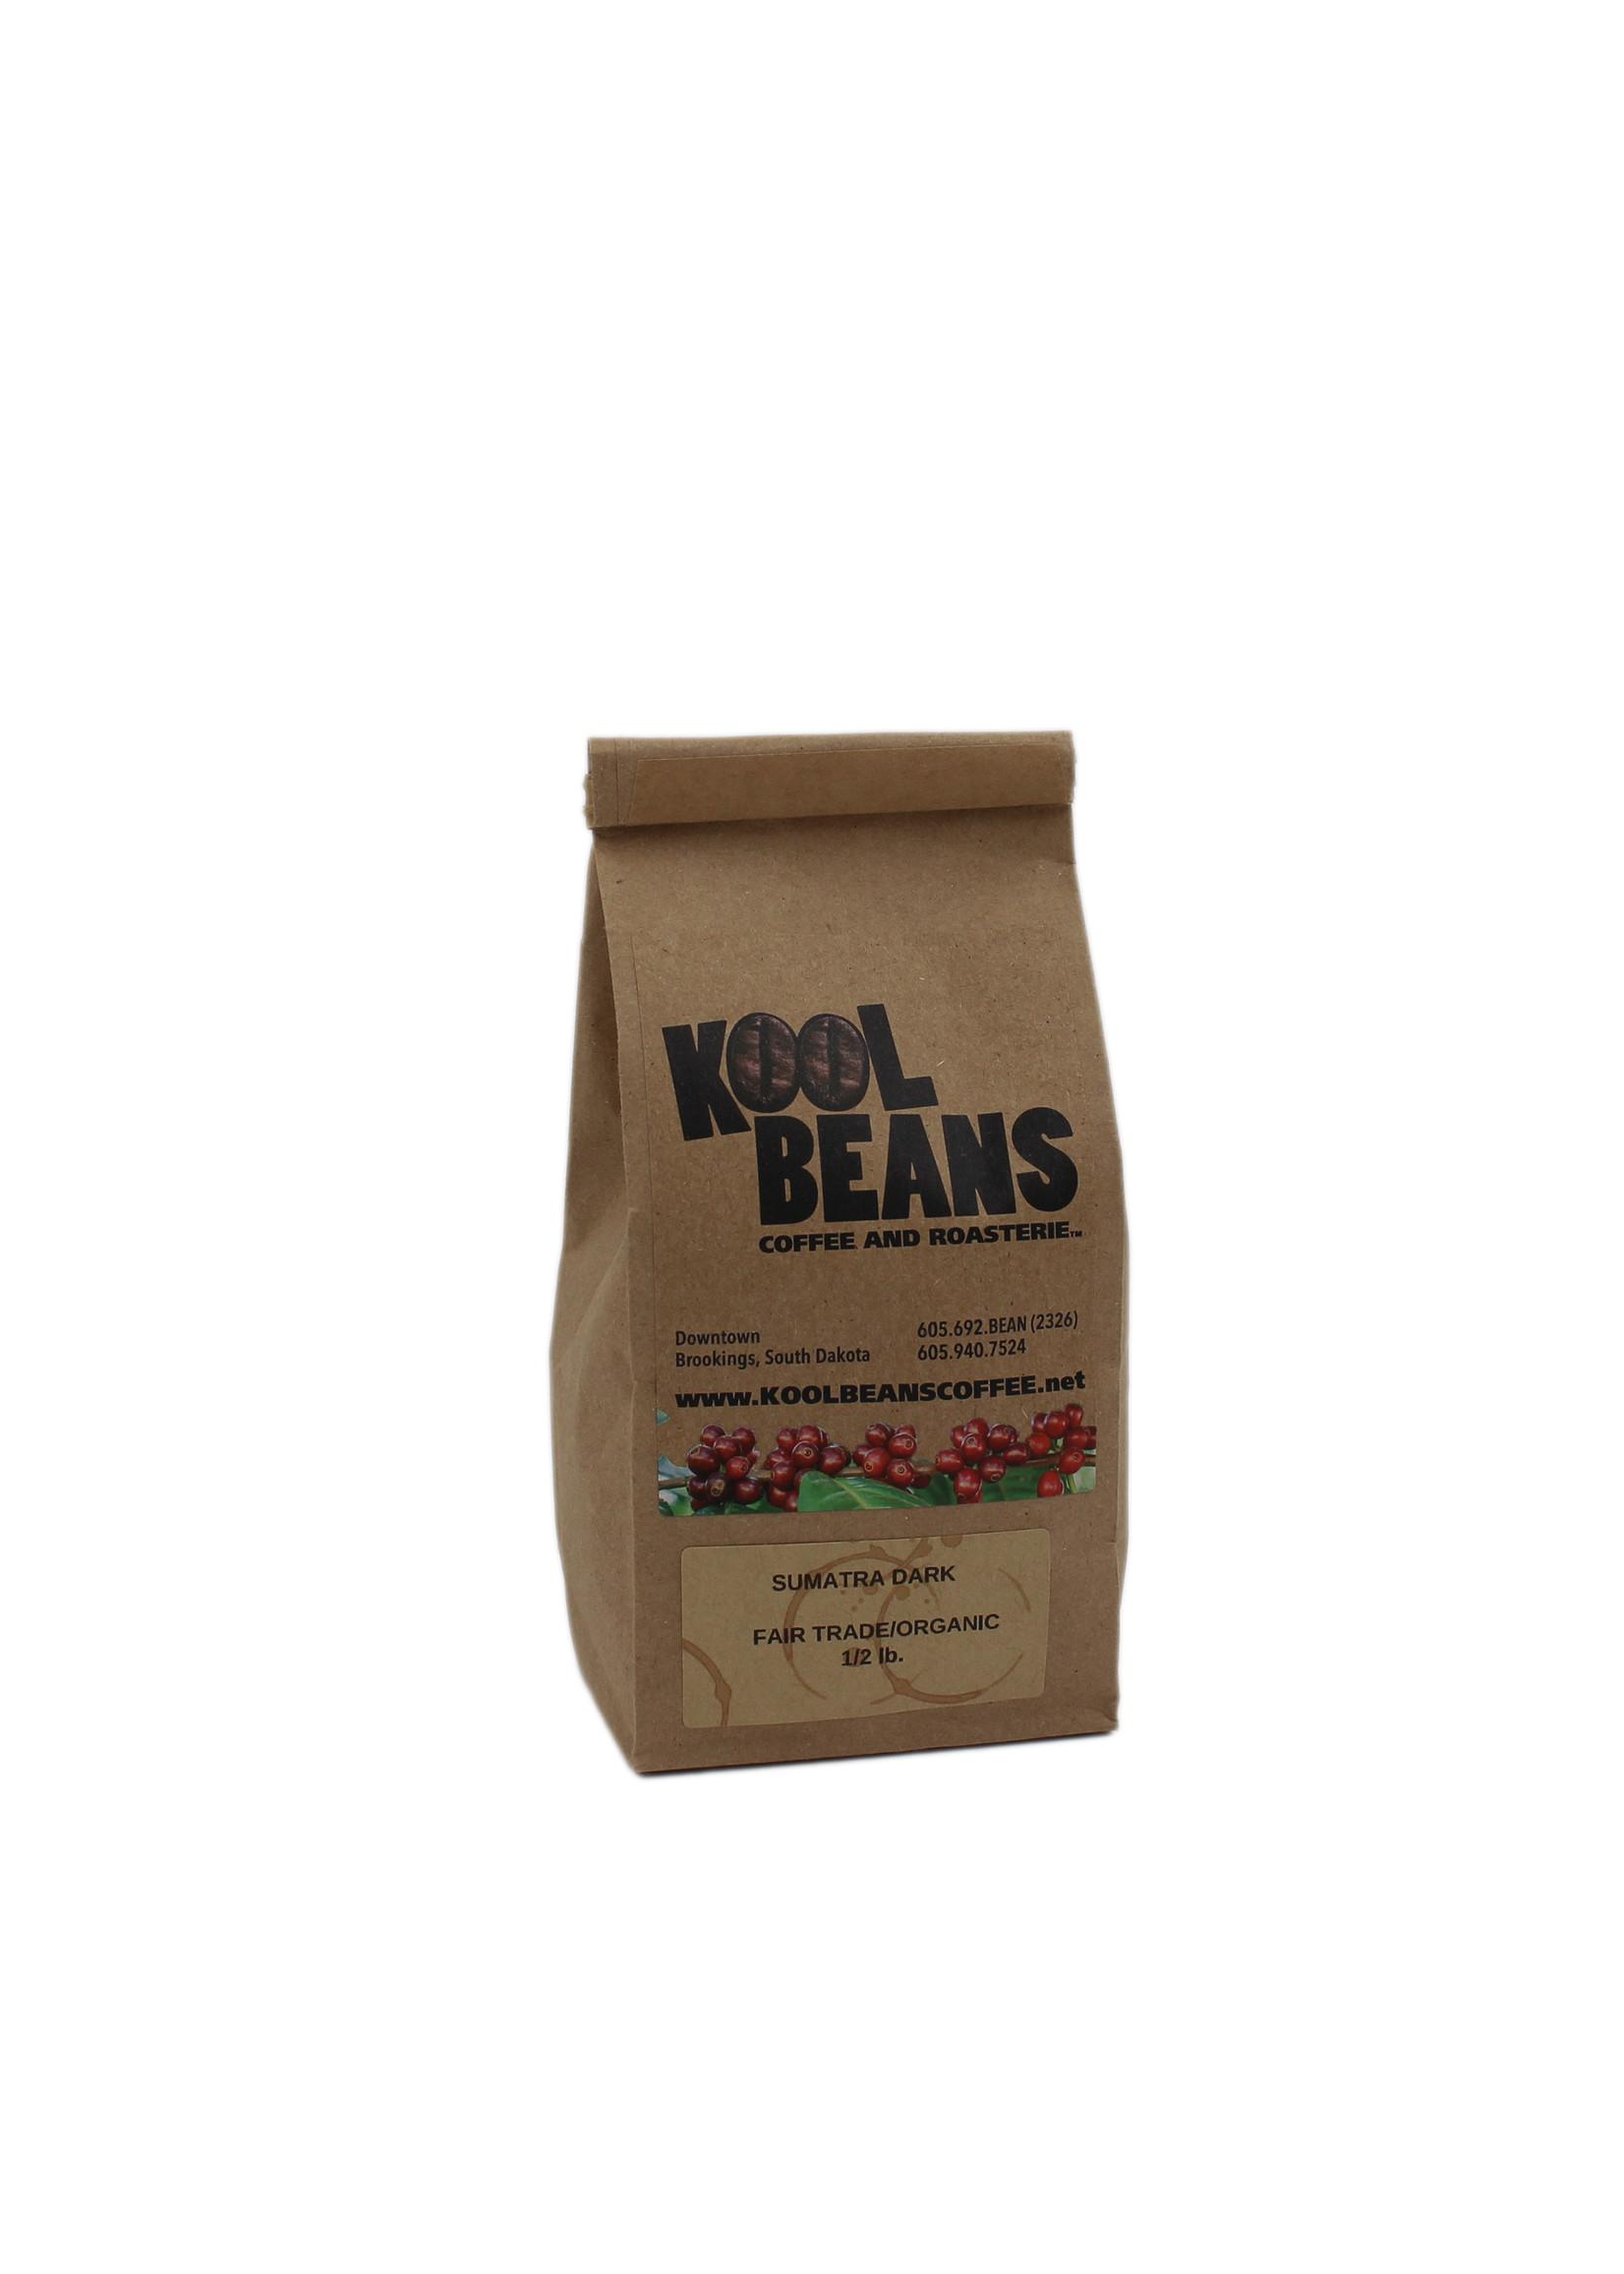 Kool Beans Coffee and Roasterie KBC Whole Beans - 8oz